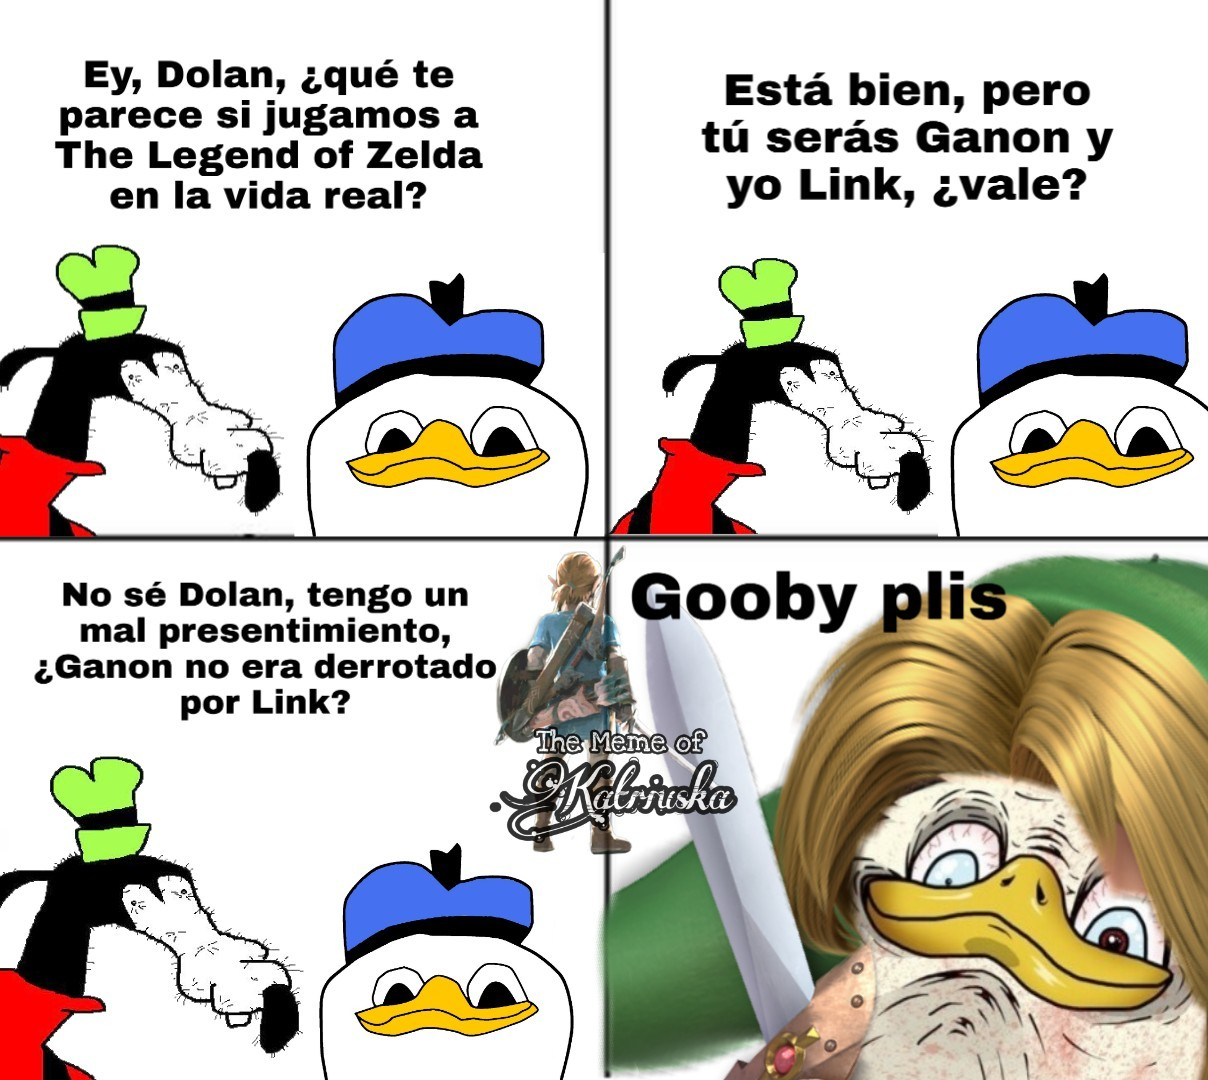 Gooby plis de Zelda - meme